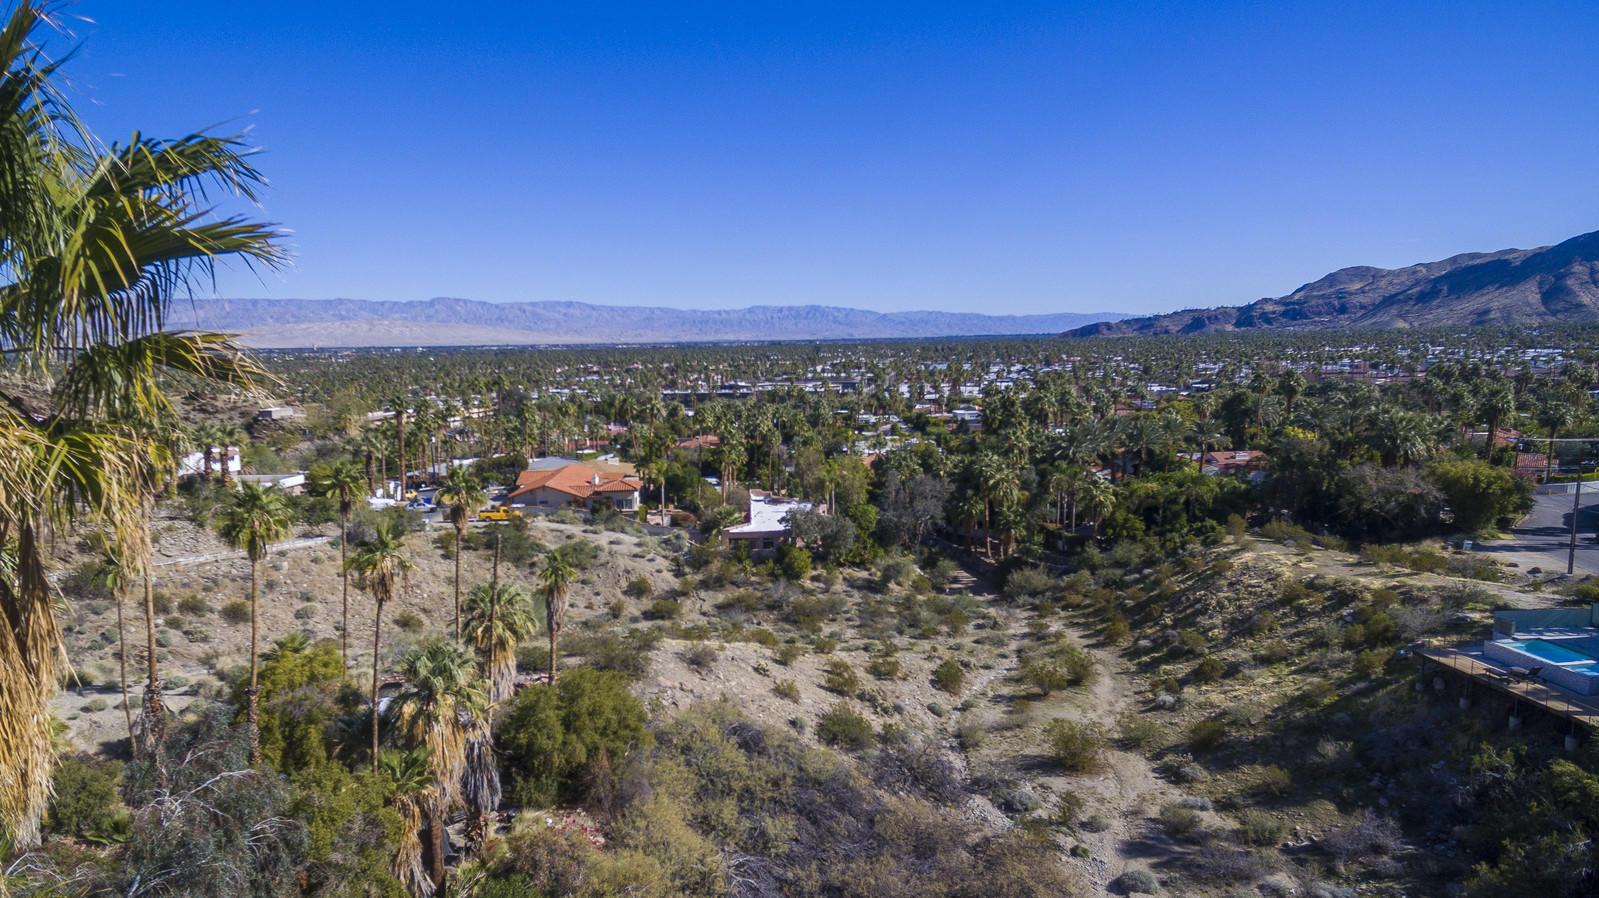 1716 Ridge Road, Palm Springs, California 92264, 3 Bedrooms Bedrooms, ,3 BathroomsBathrooms,Residential,For Sale,1716 Ridge Road,219037688